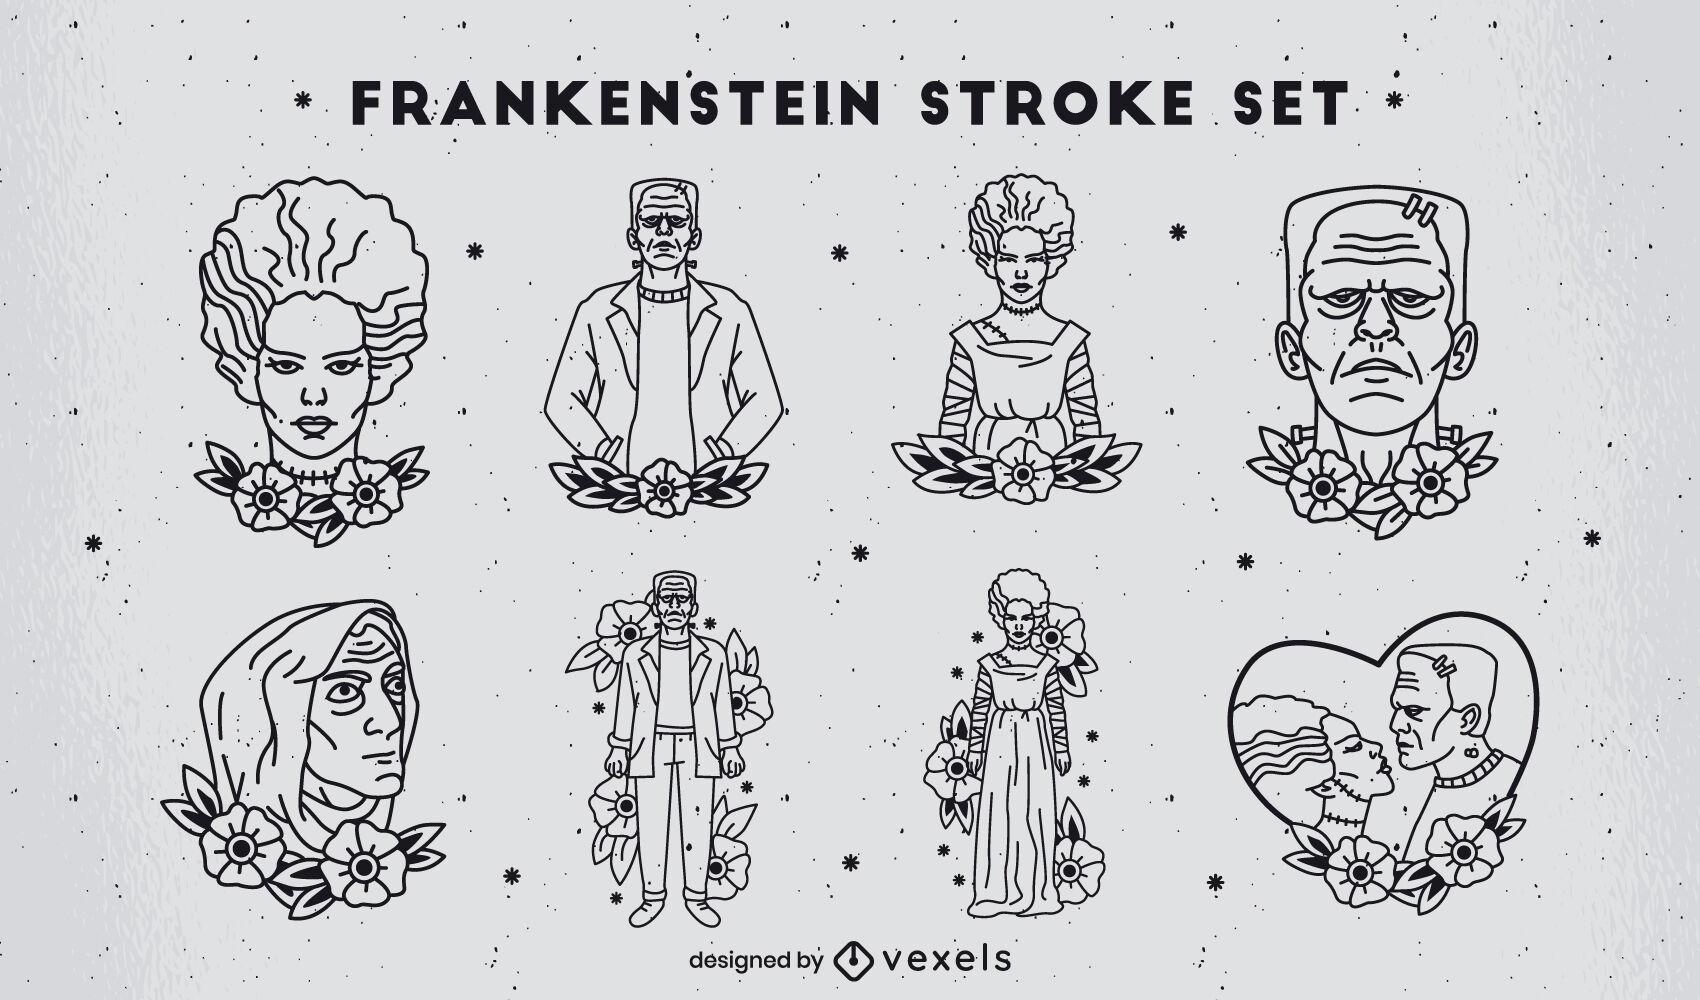 Frankenstein stroke tattoo style characters set